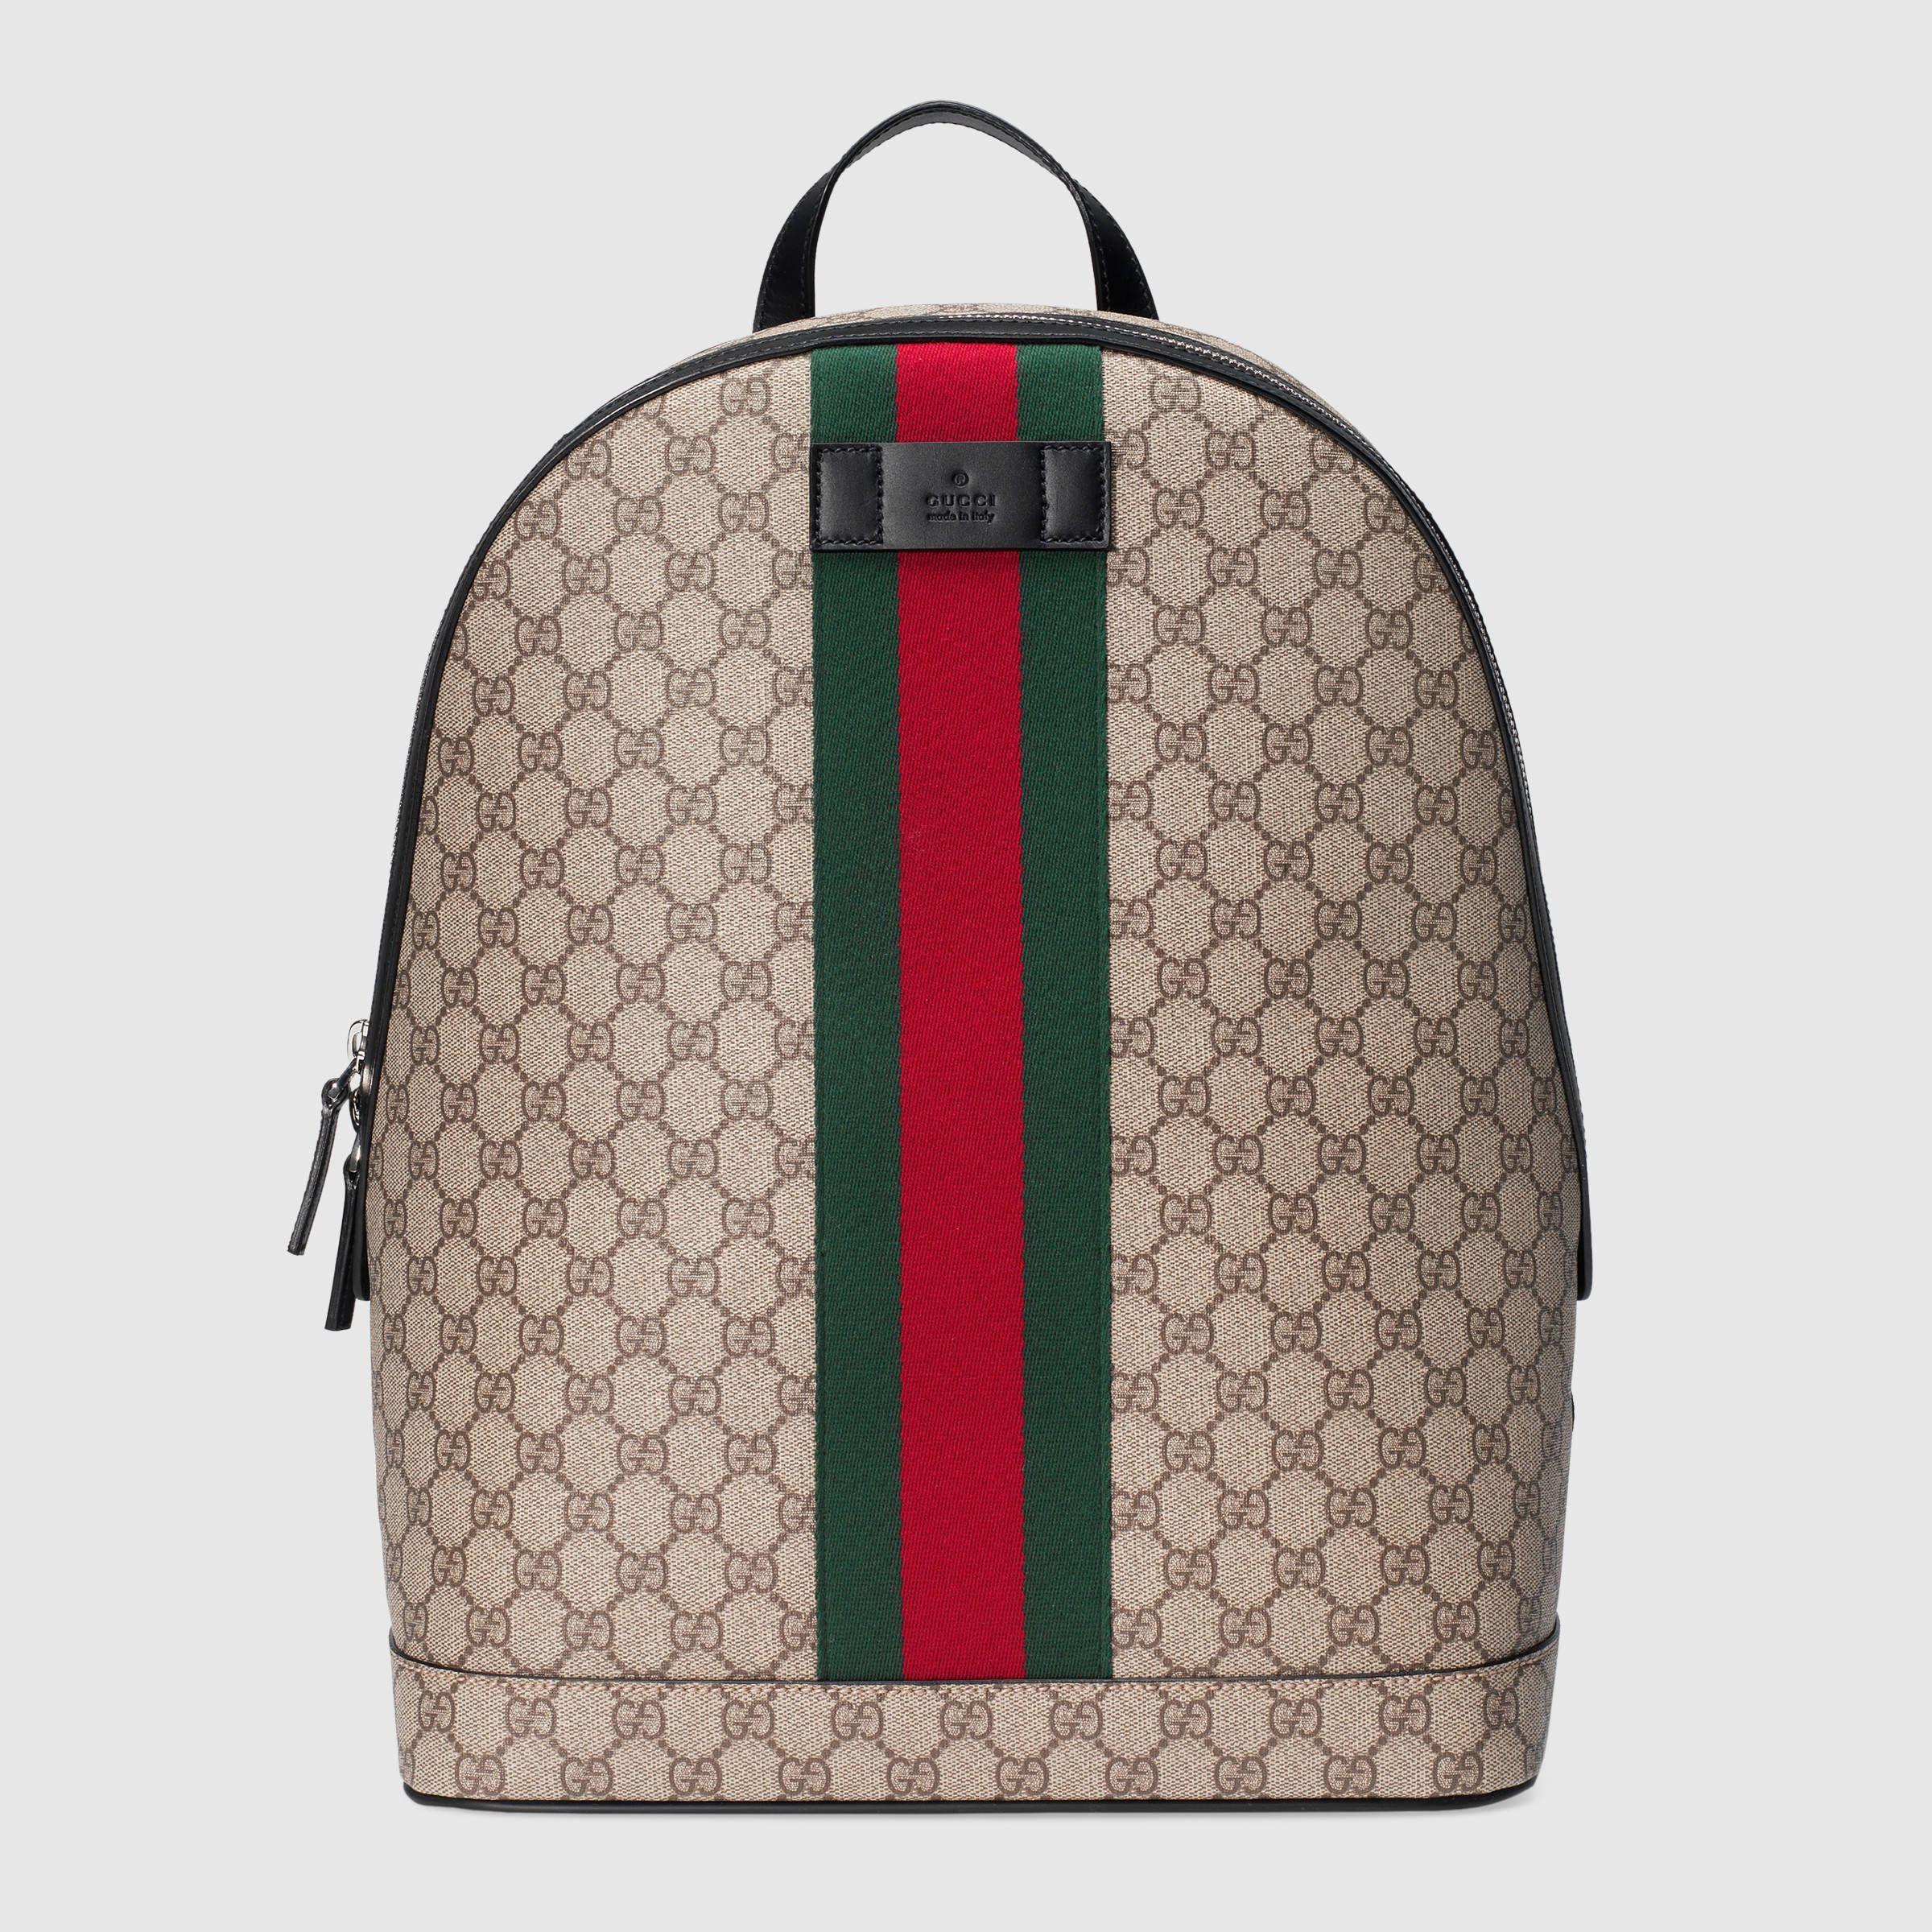 0910244ae133 Sac à dos en toile Suprême GG avec ruban Web   Accessoire   Gucci ...